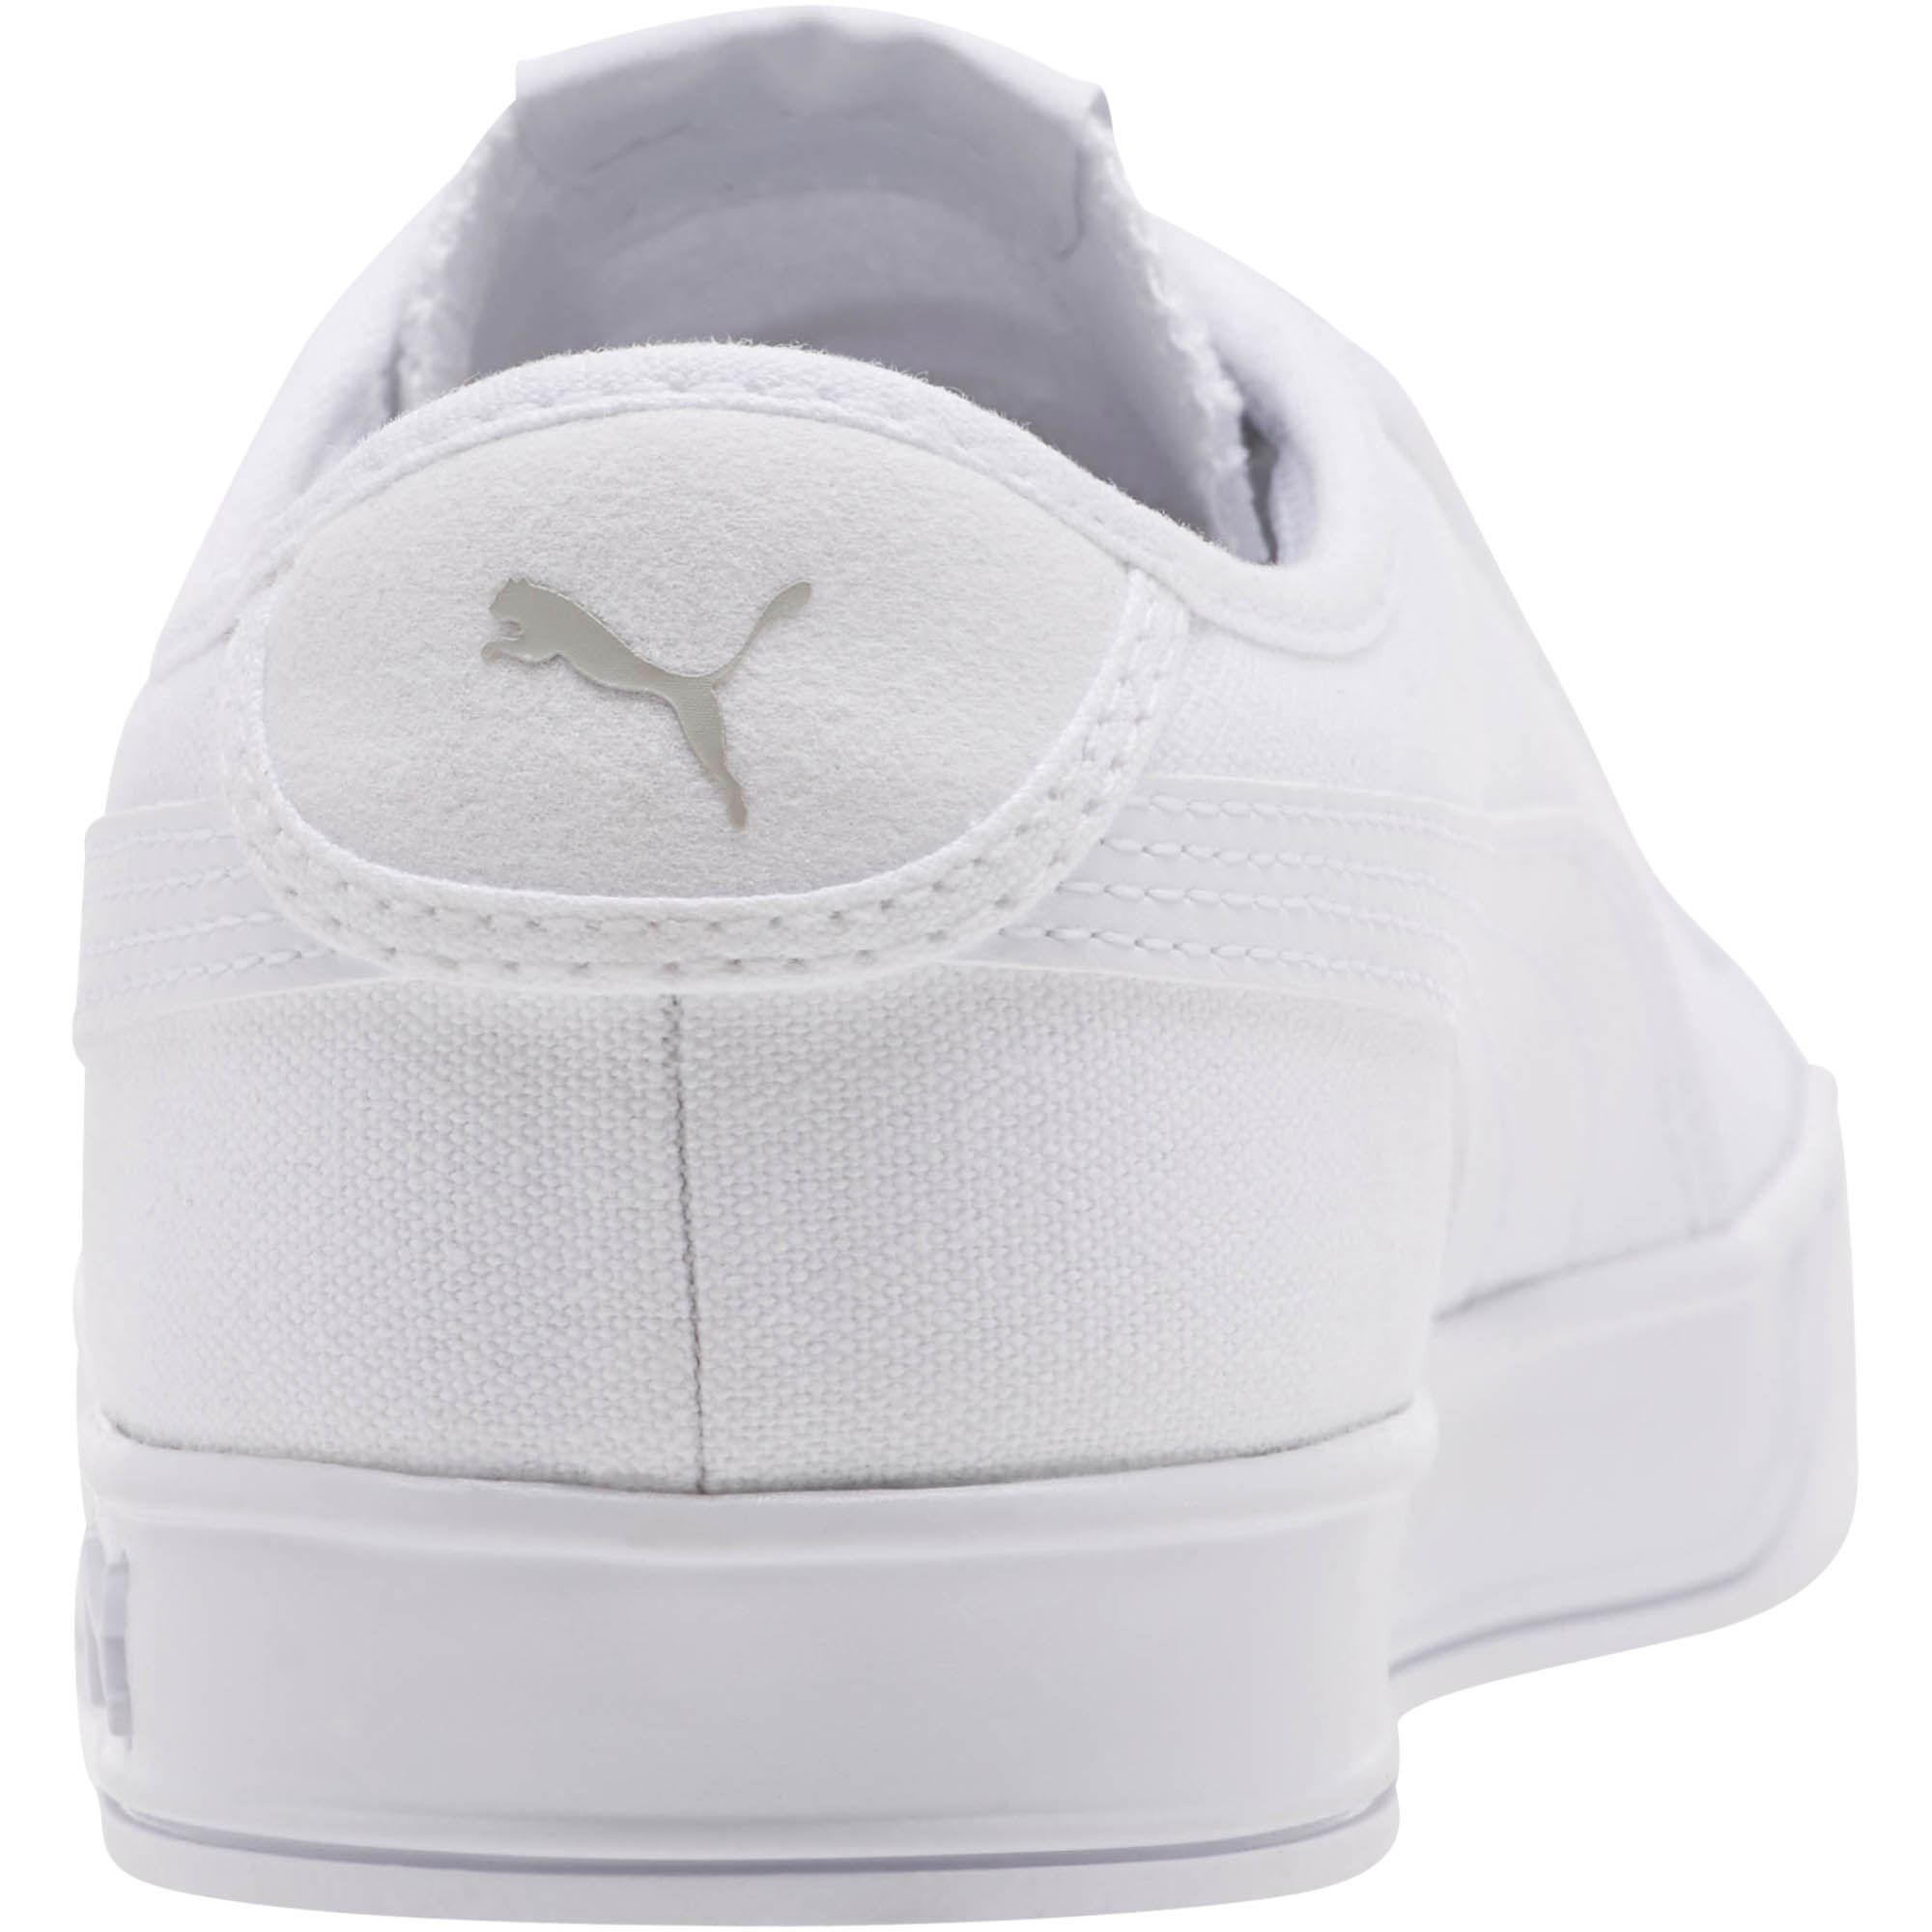 9999a5c6ea38b PUMA Smash V2 Vulc Cv Men's Sneakers in White for Men - Lyst